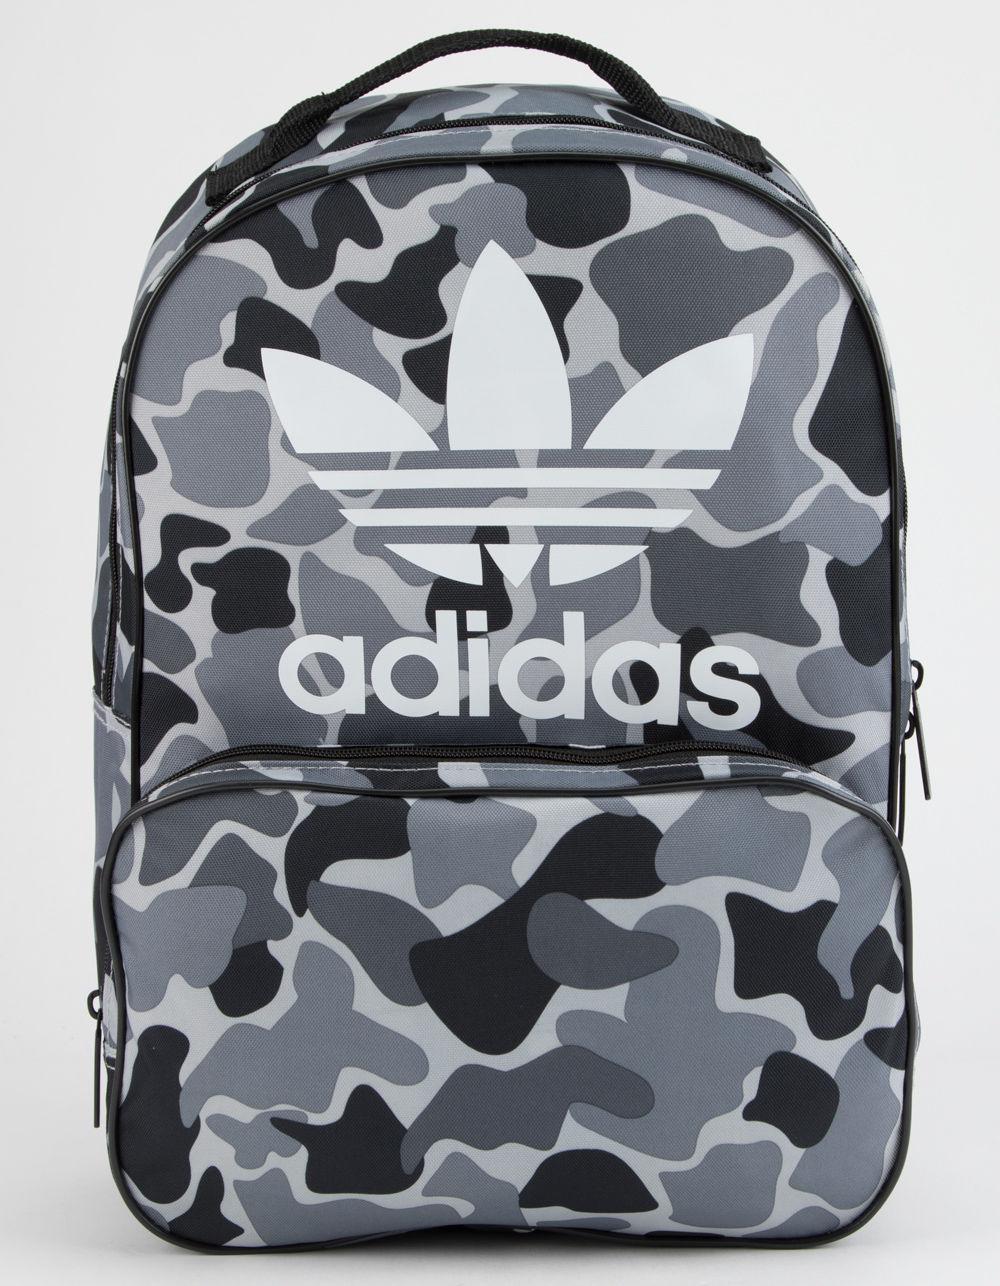 Adidas - Originals Santiago Black Camo Backpack for Men - Lyst. View  fullscreen ffa5b0aef9e87